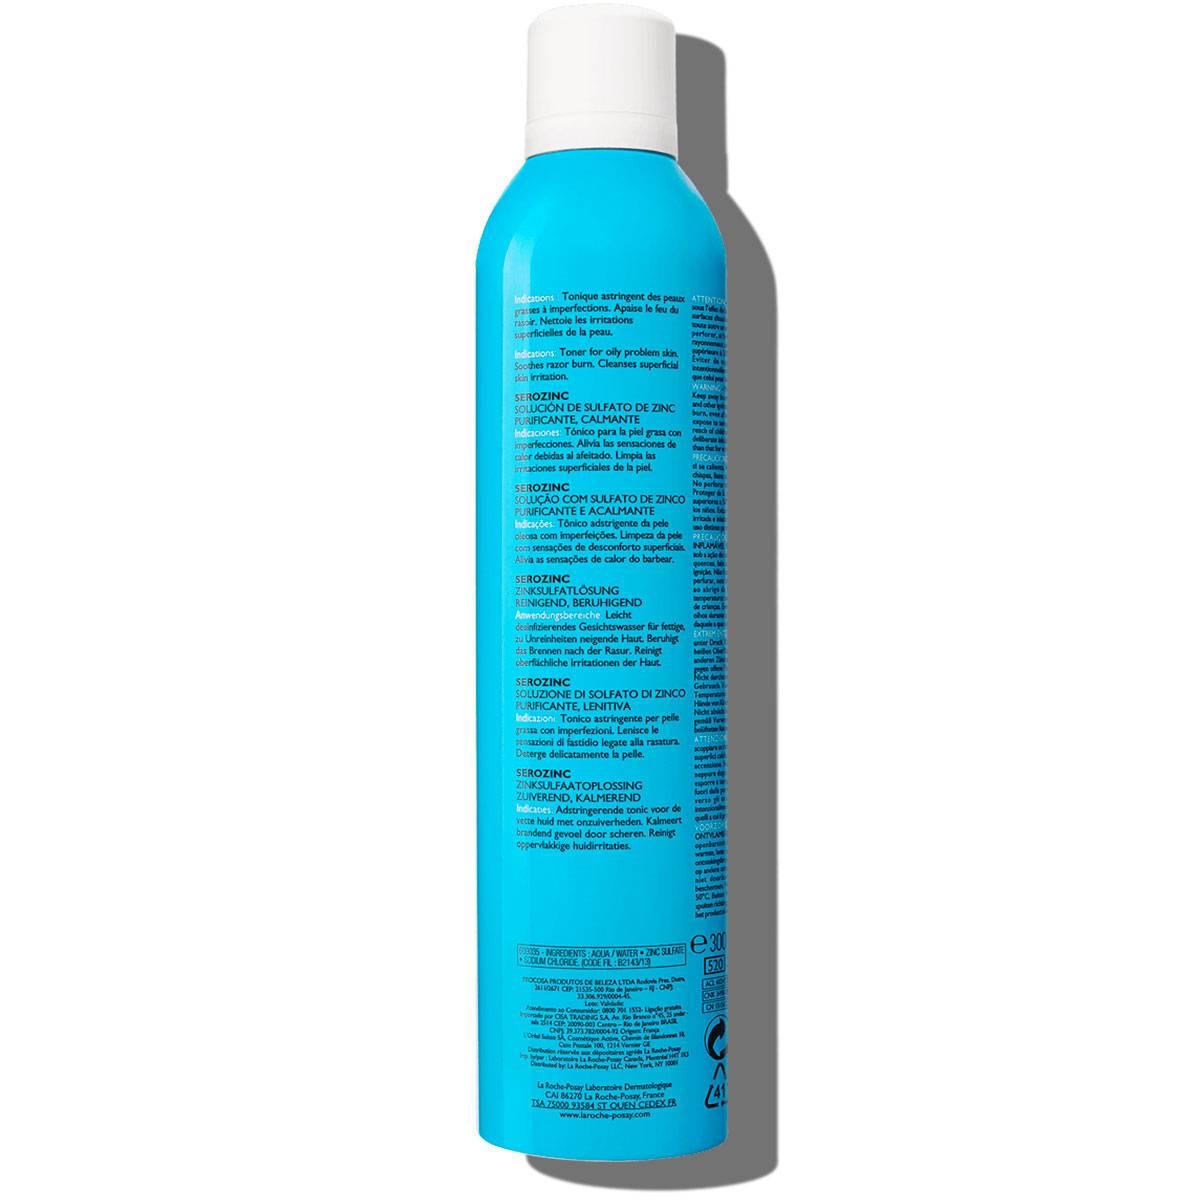 La Roche Posay Tuotesivu Serozinc Spray Zinc 300ml 3337875565783 Bac